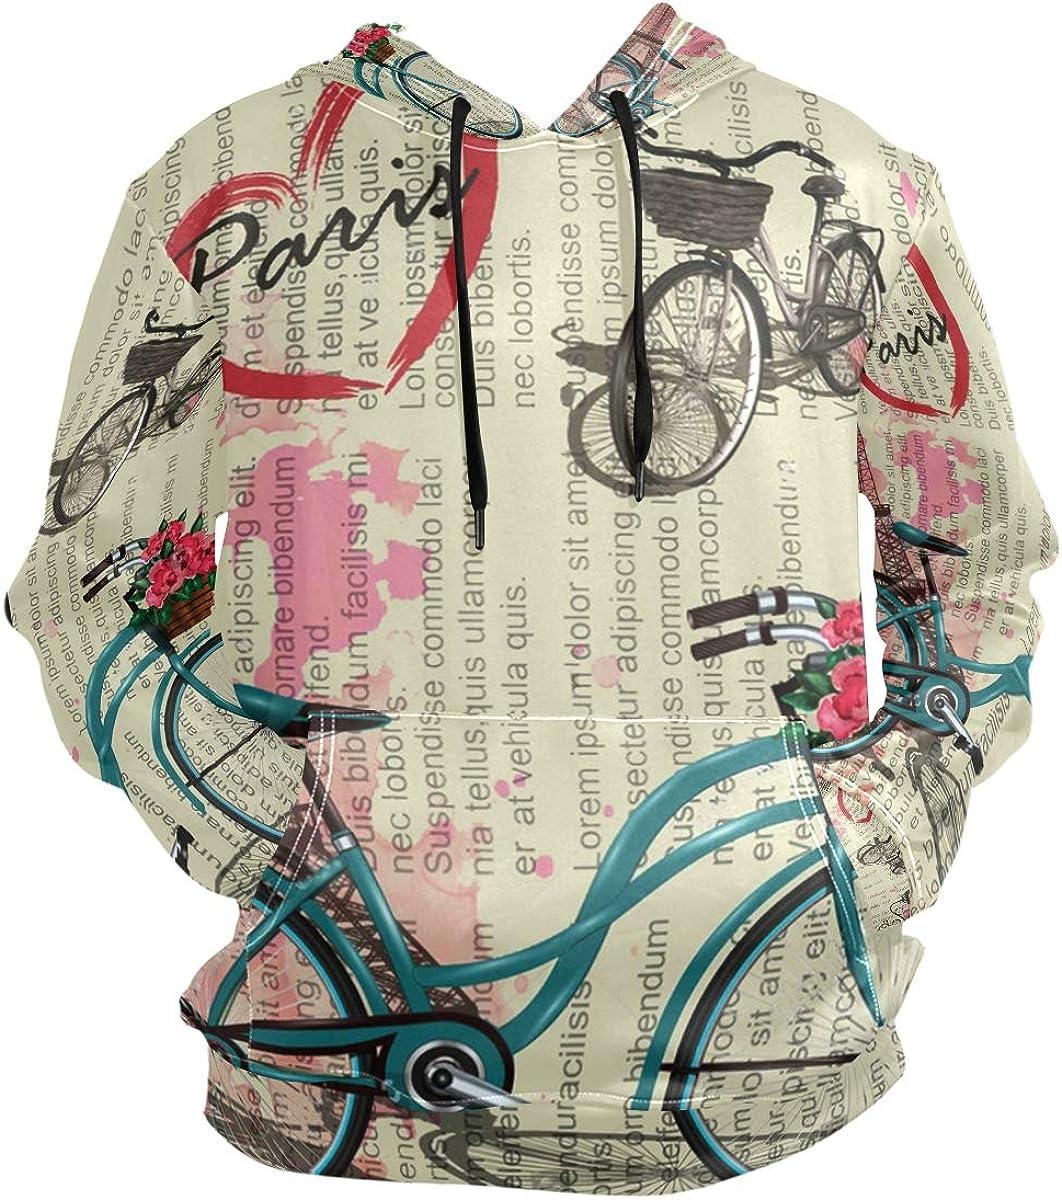 SLHFPX Vintage Paris Newspaper Hoodie 3D Pullover Hooded Long Sleeve Workout Sweatshirts